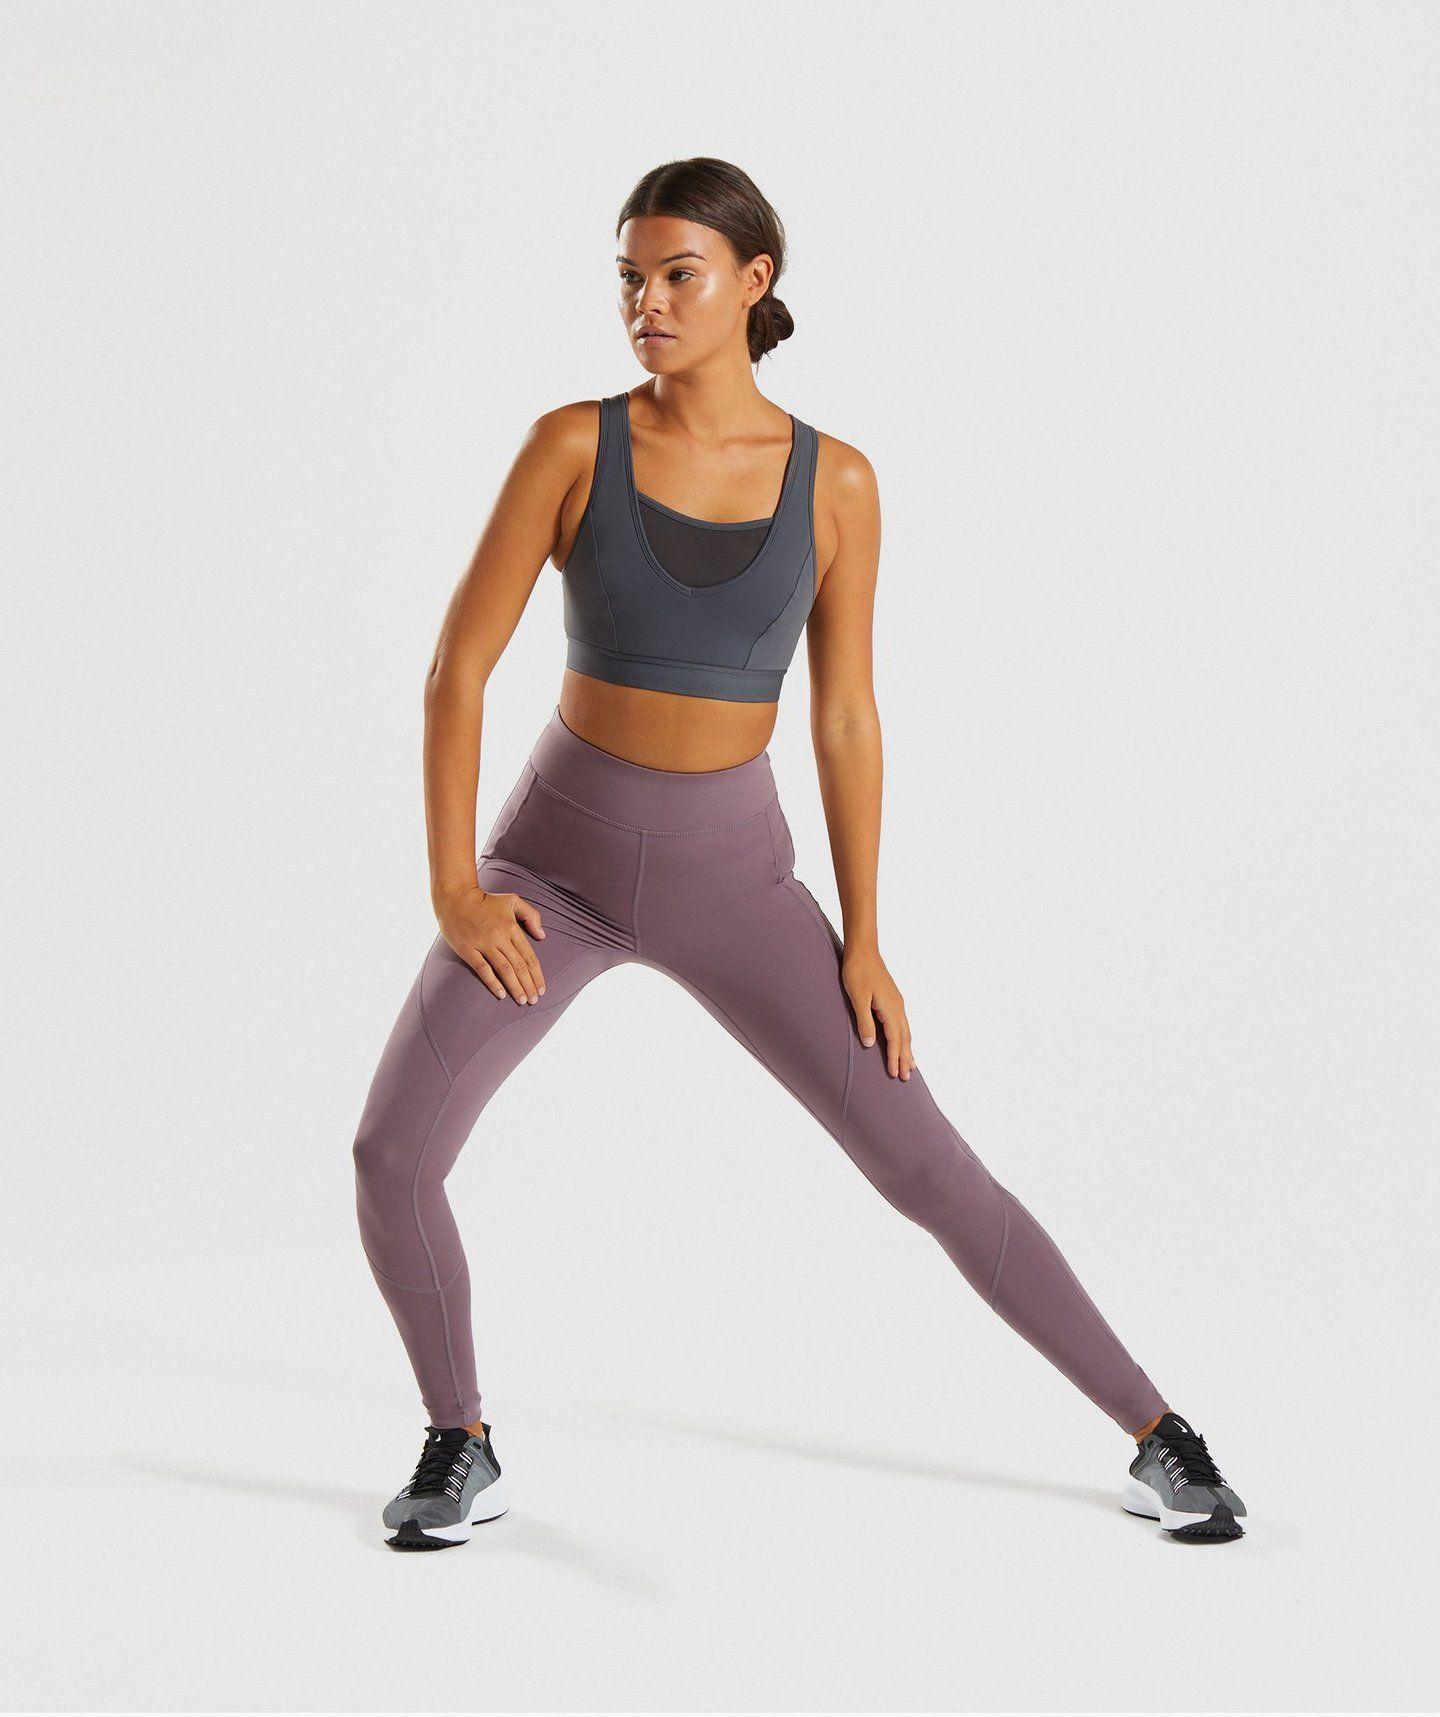 Gymshark Endurance Sports Bra Charcoal 2 Workout bras